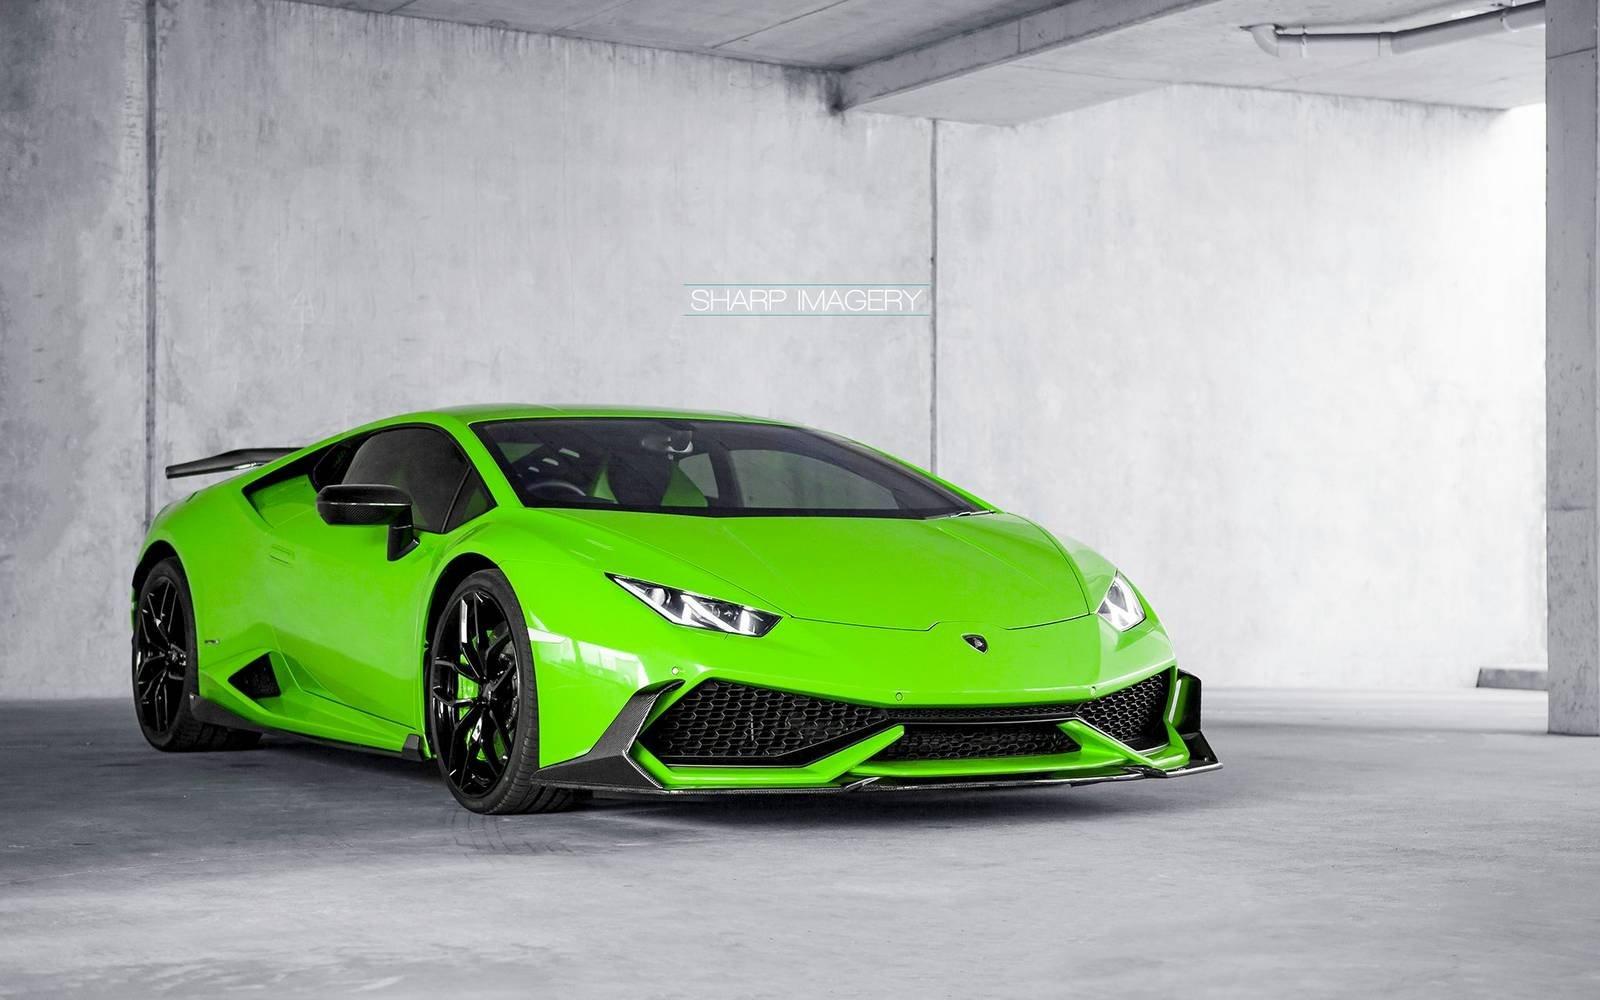 Wallpapers Green And Lamborghini On Pinterest: 2016 Lamborghini Huracan Akrapovic Exhaust Green Cars